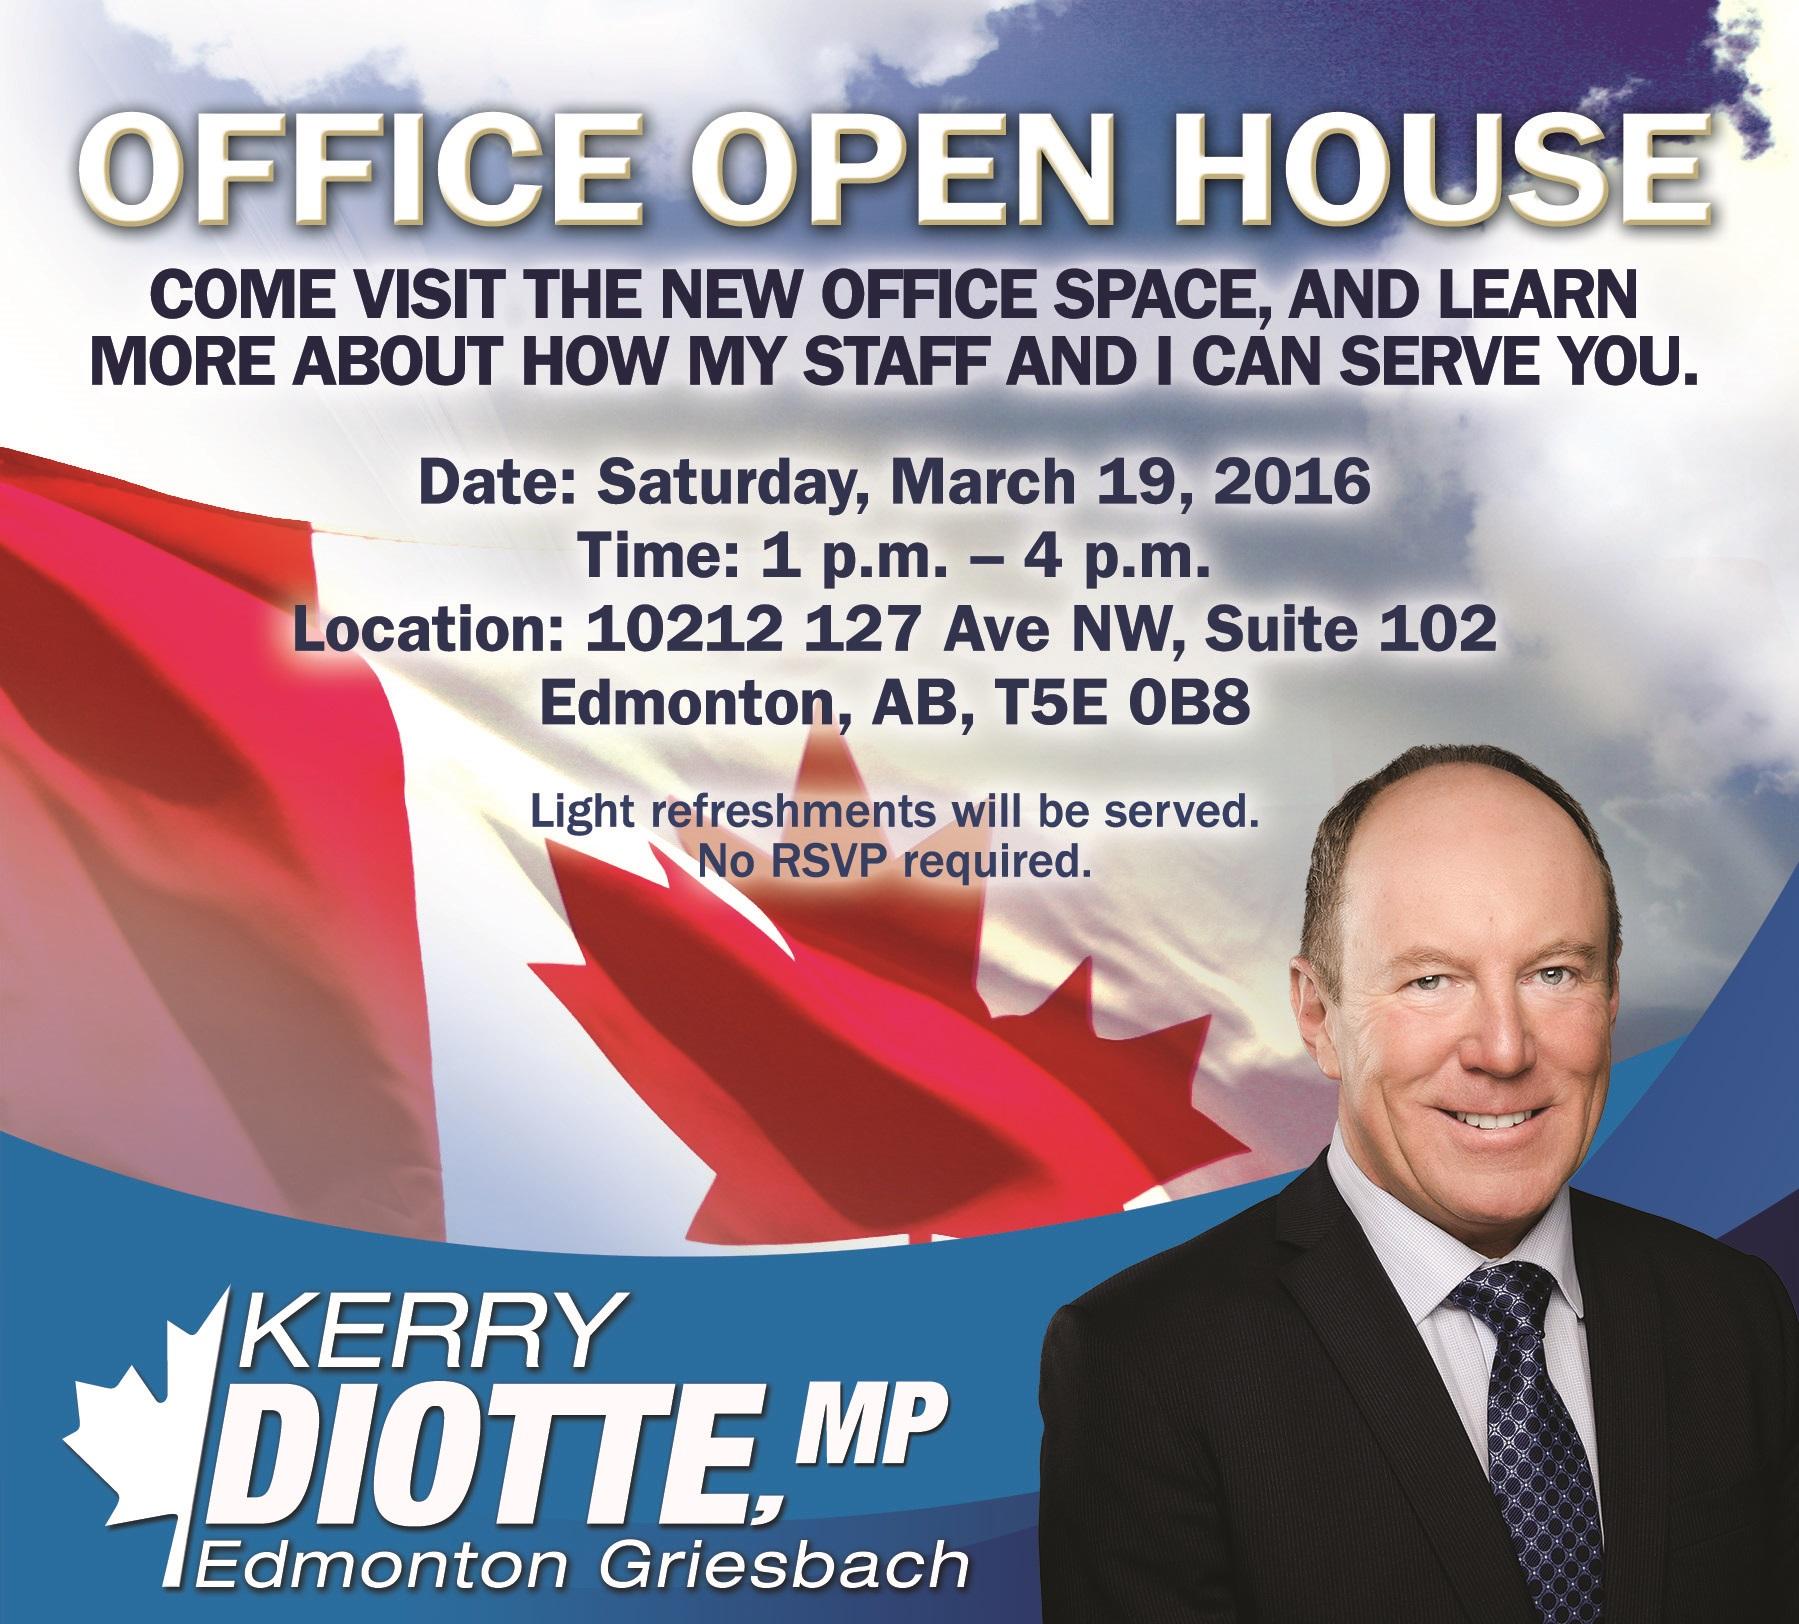 Office Open House Invite